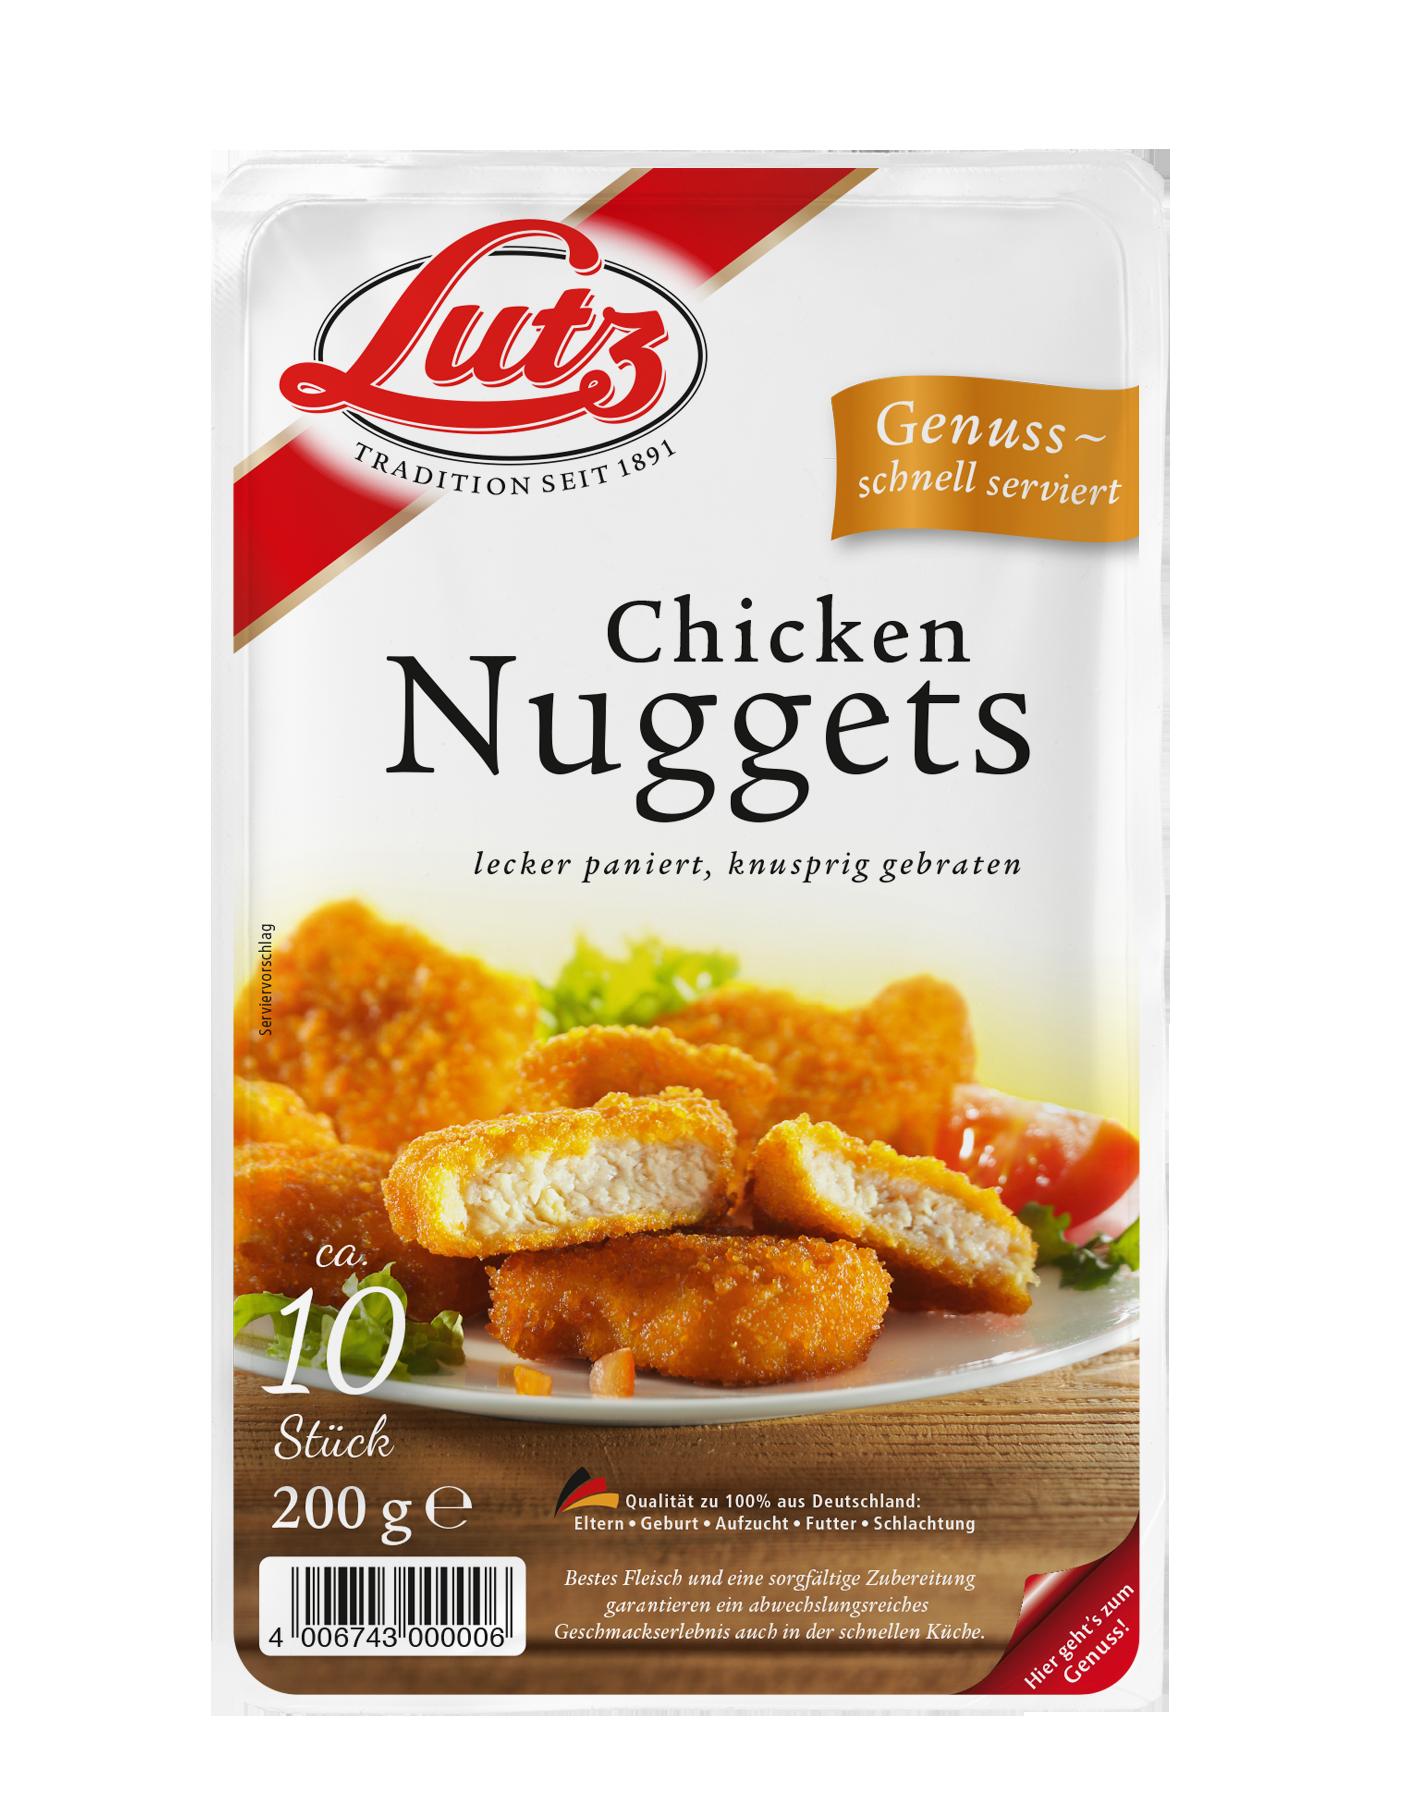 Convenience_Chicken_Nuggets